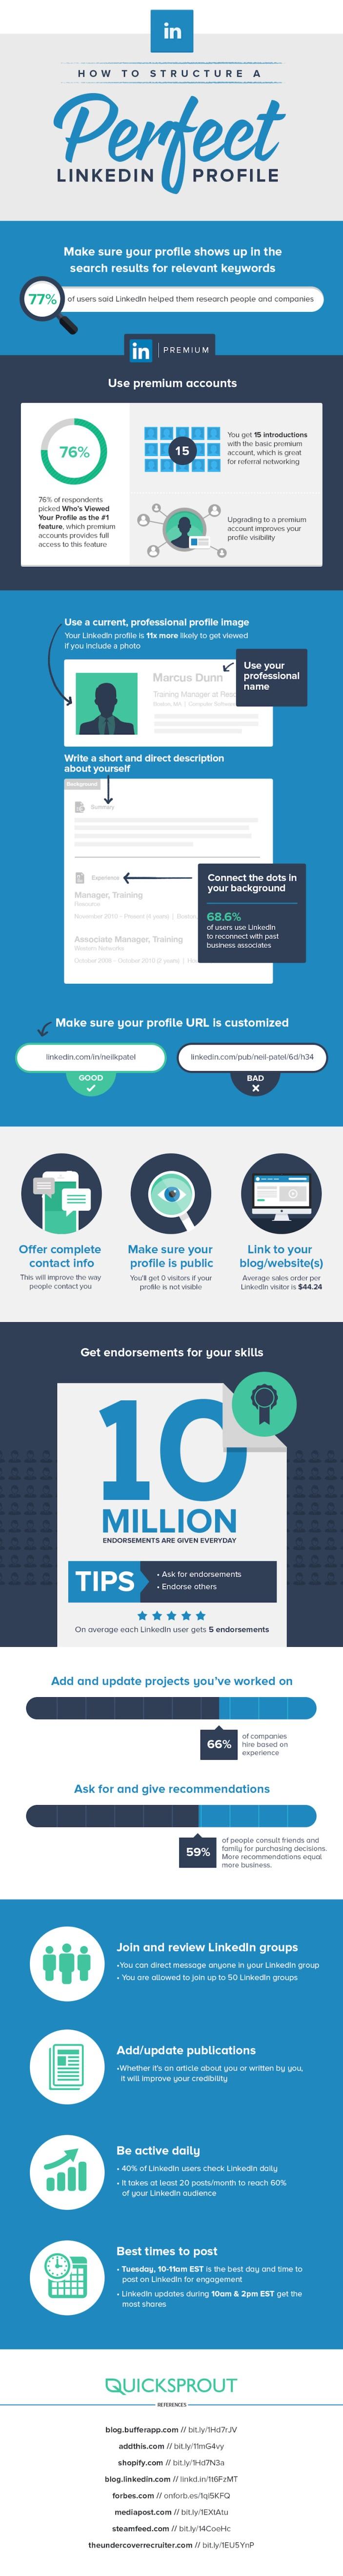 Linkedin Infographic